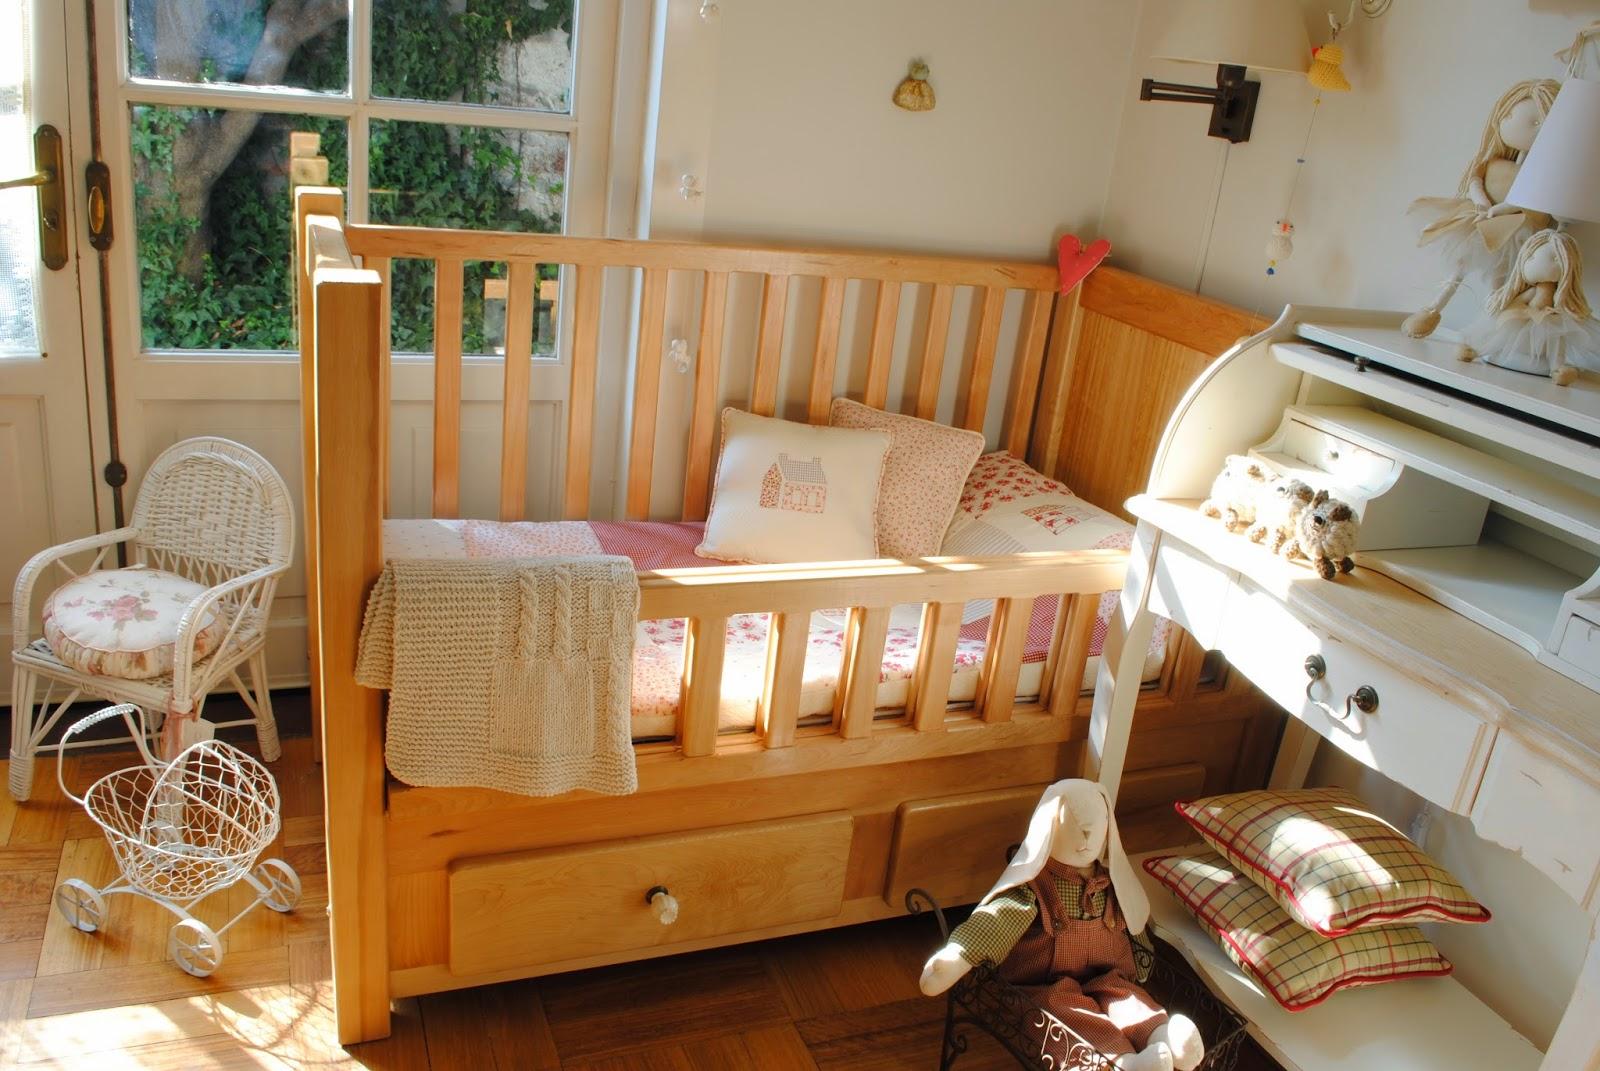 Paz montealegre decoraci n cunas de madera para beb - Cuna de mimbre para bebe ...